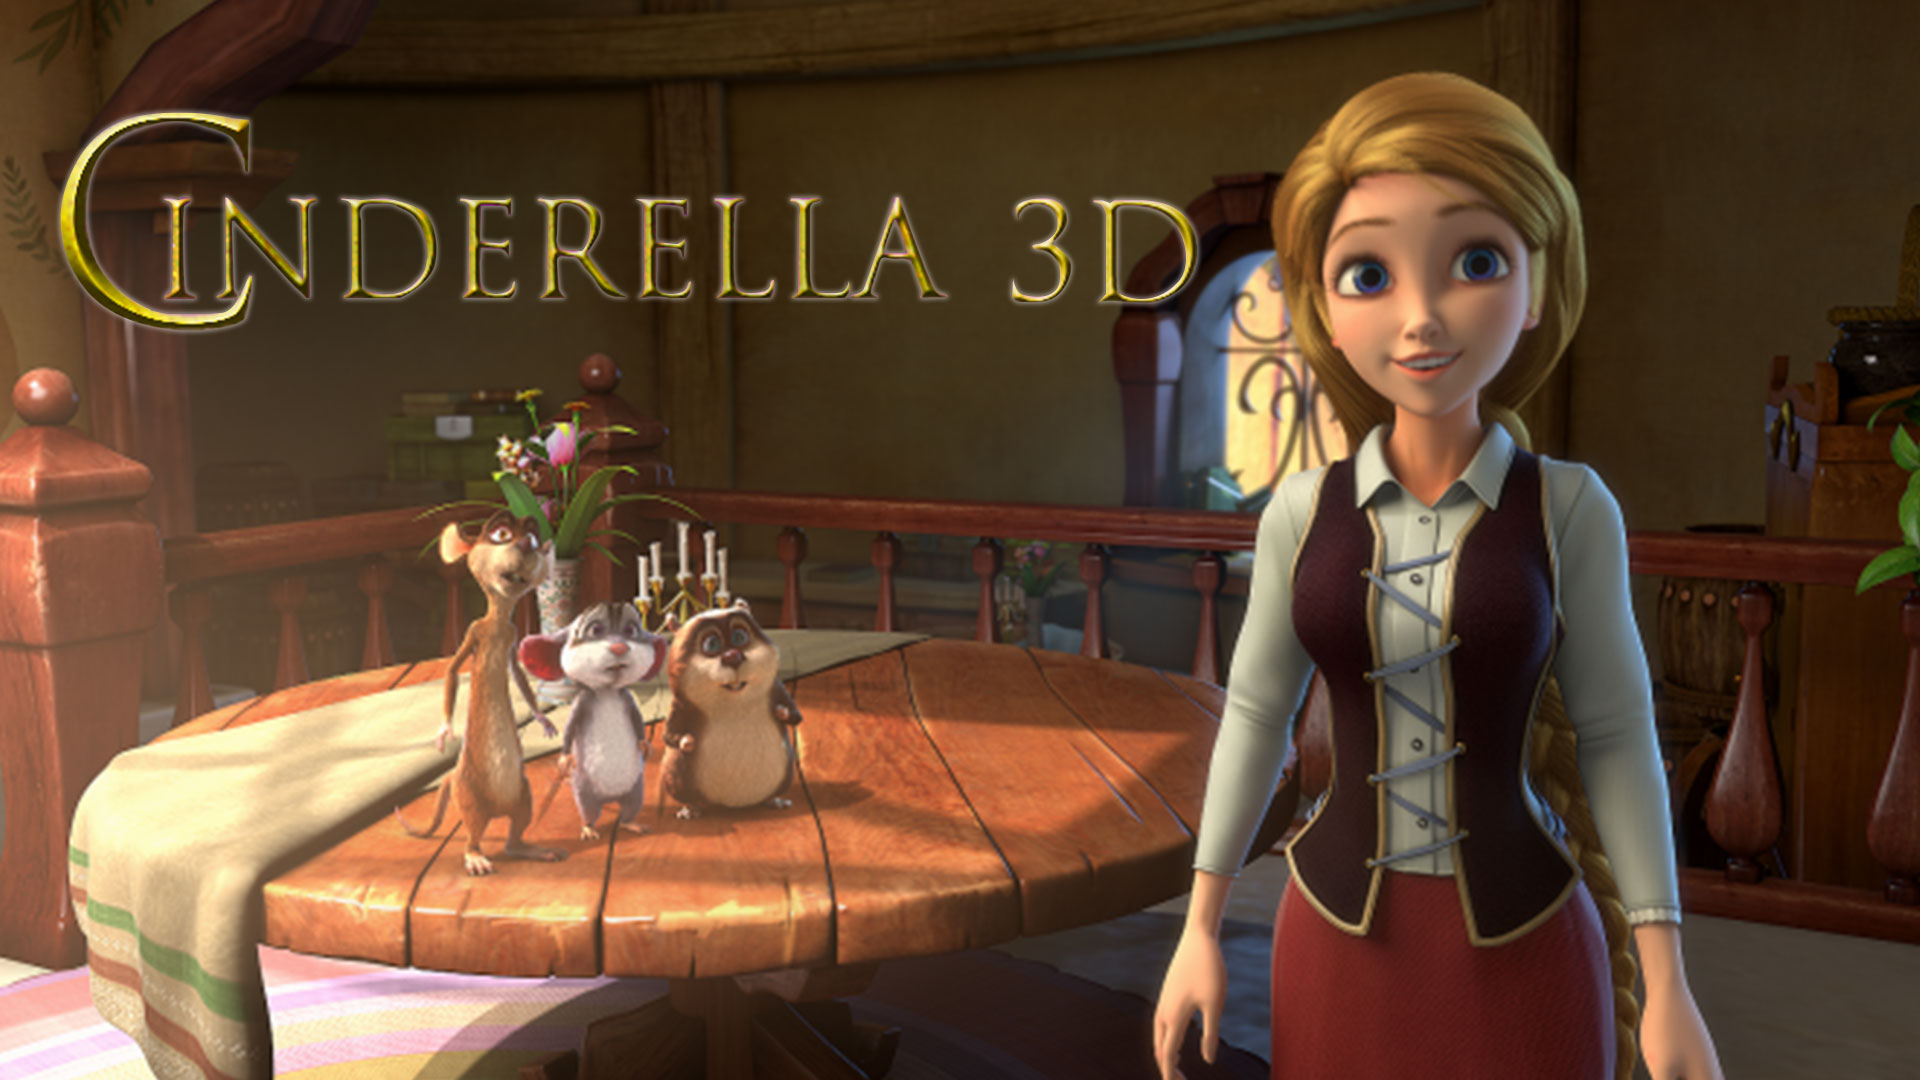 VV_cinderella_3d_banner.jpg